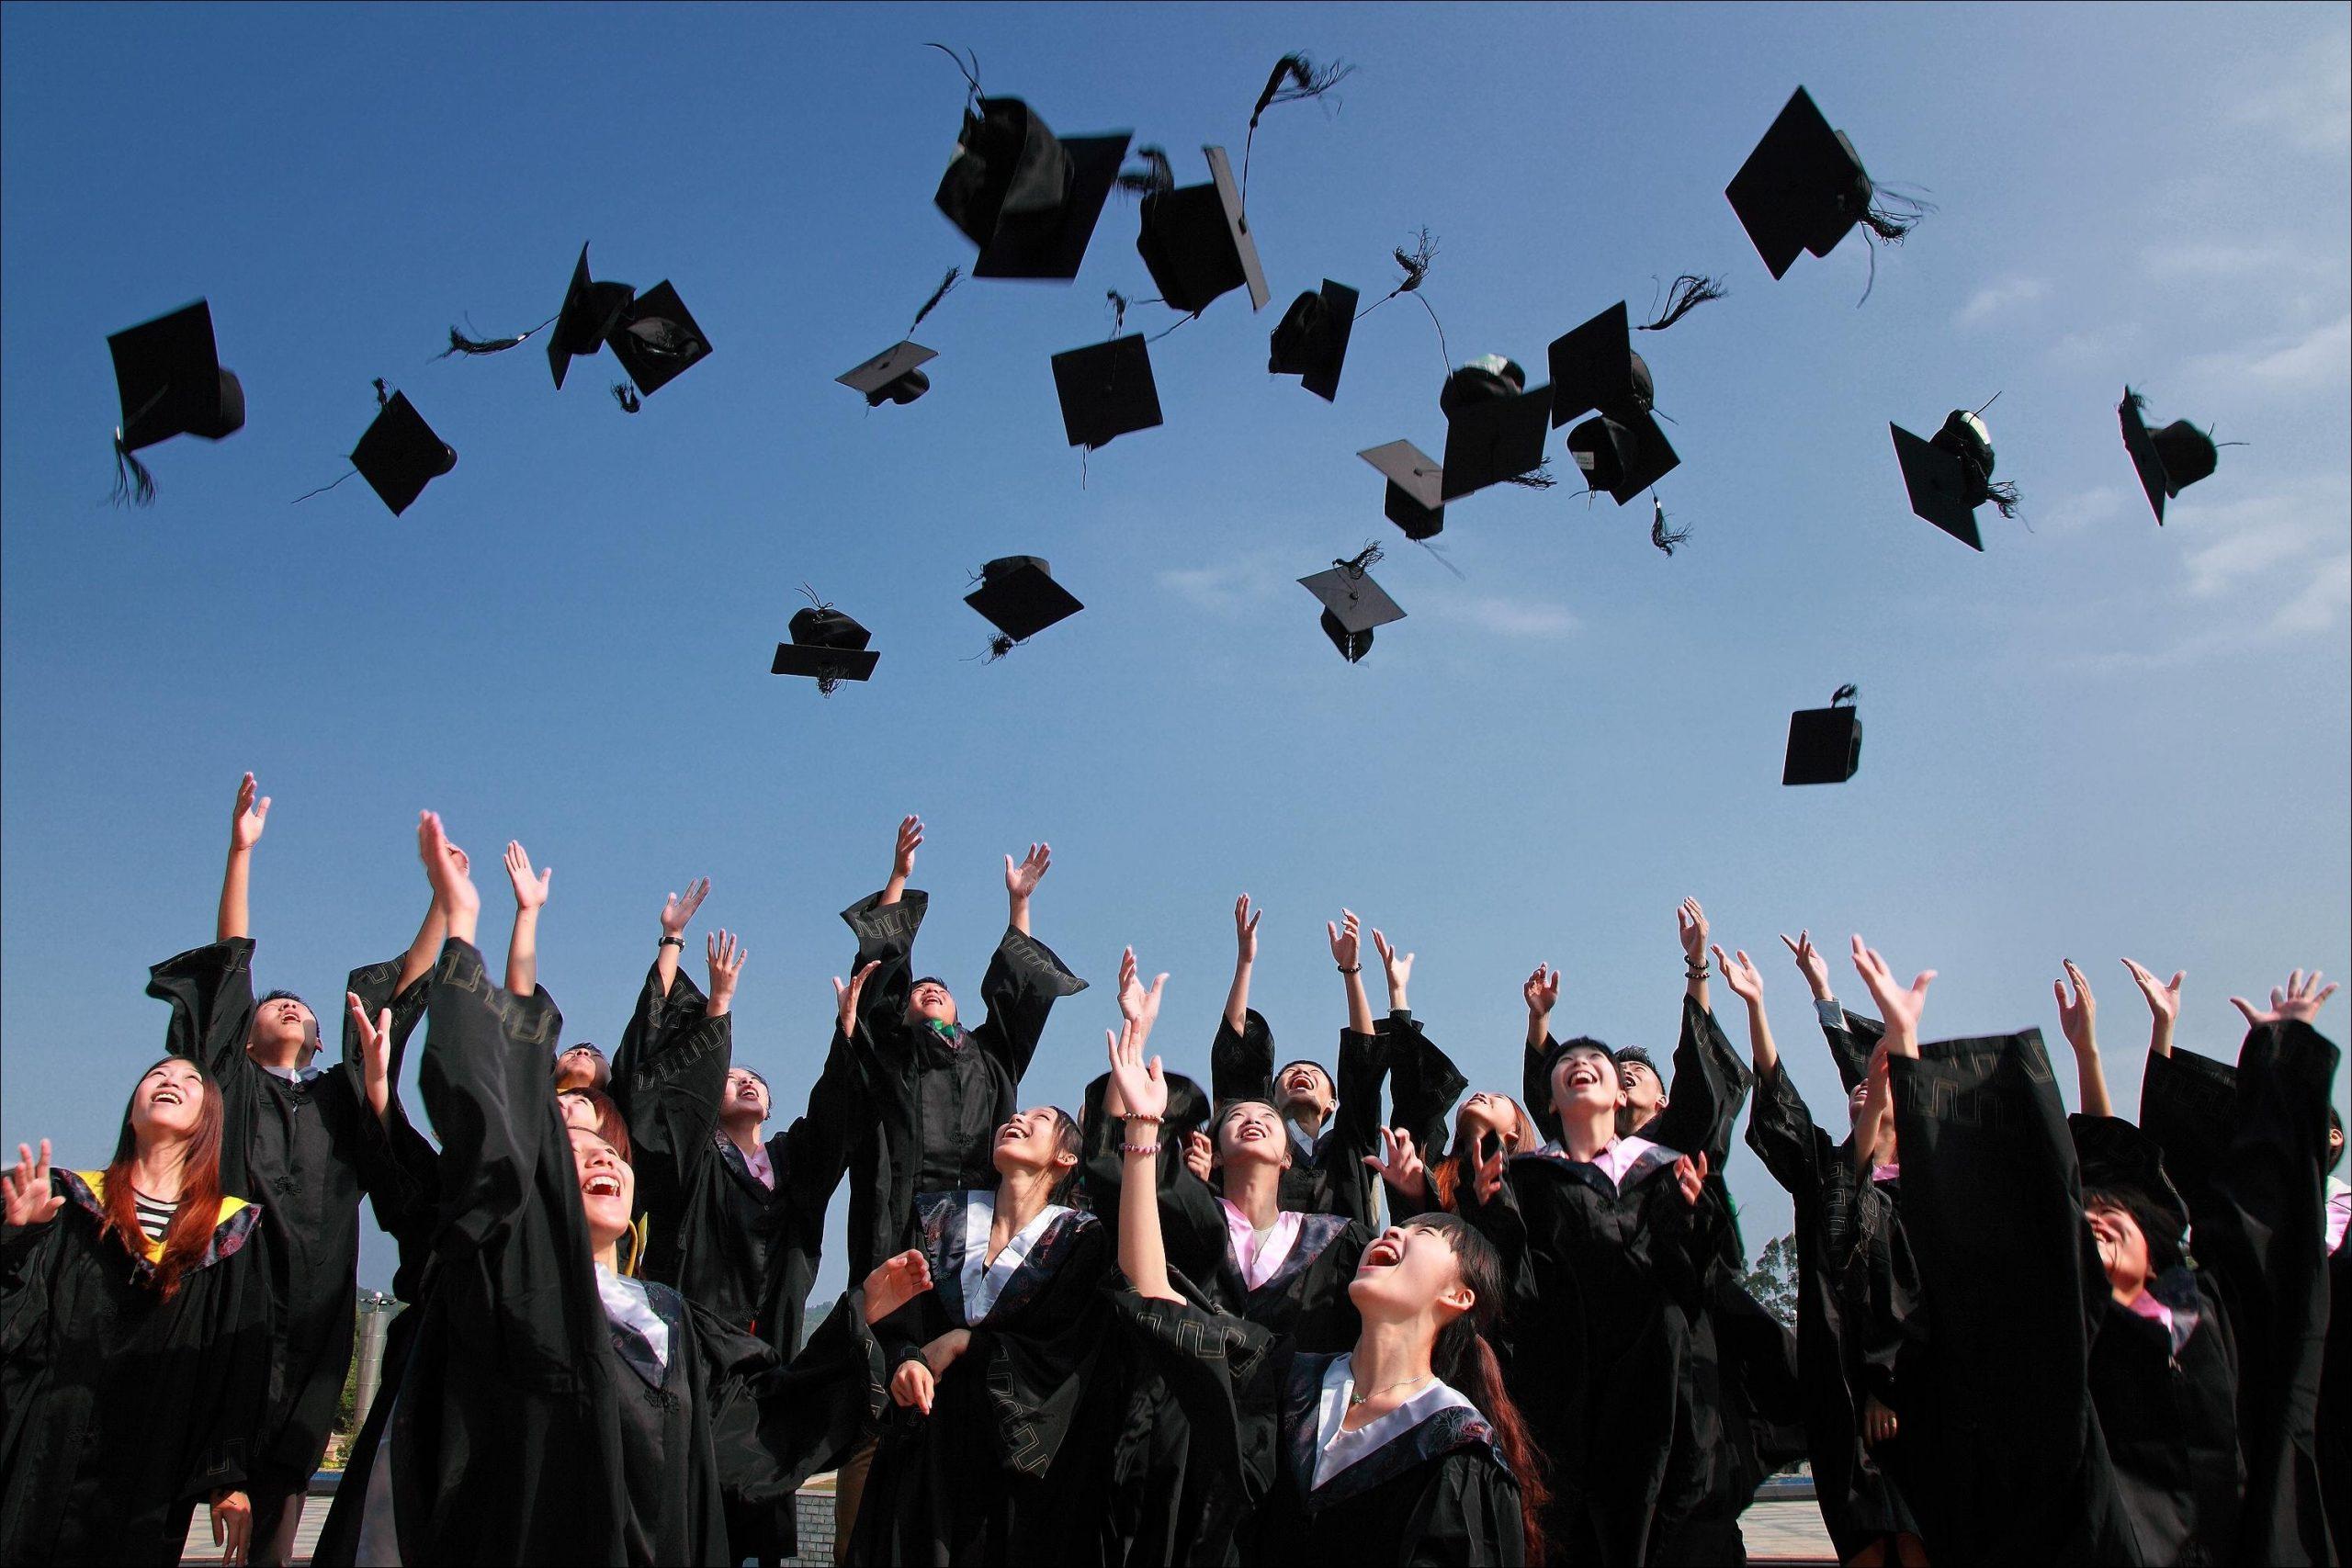 Availing an education loan